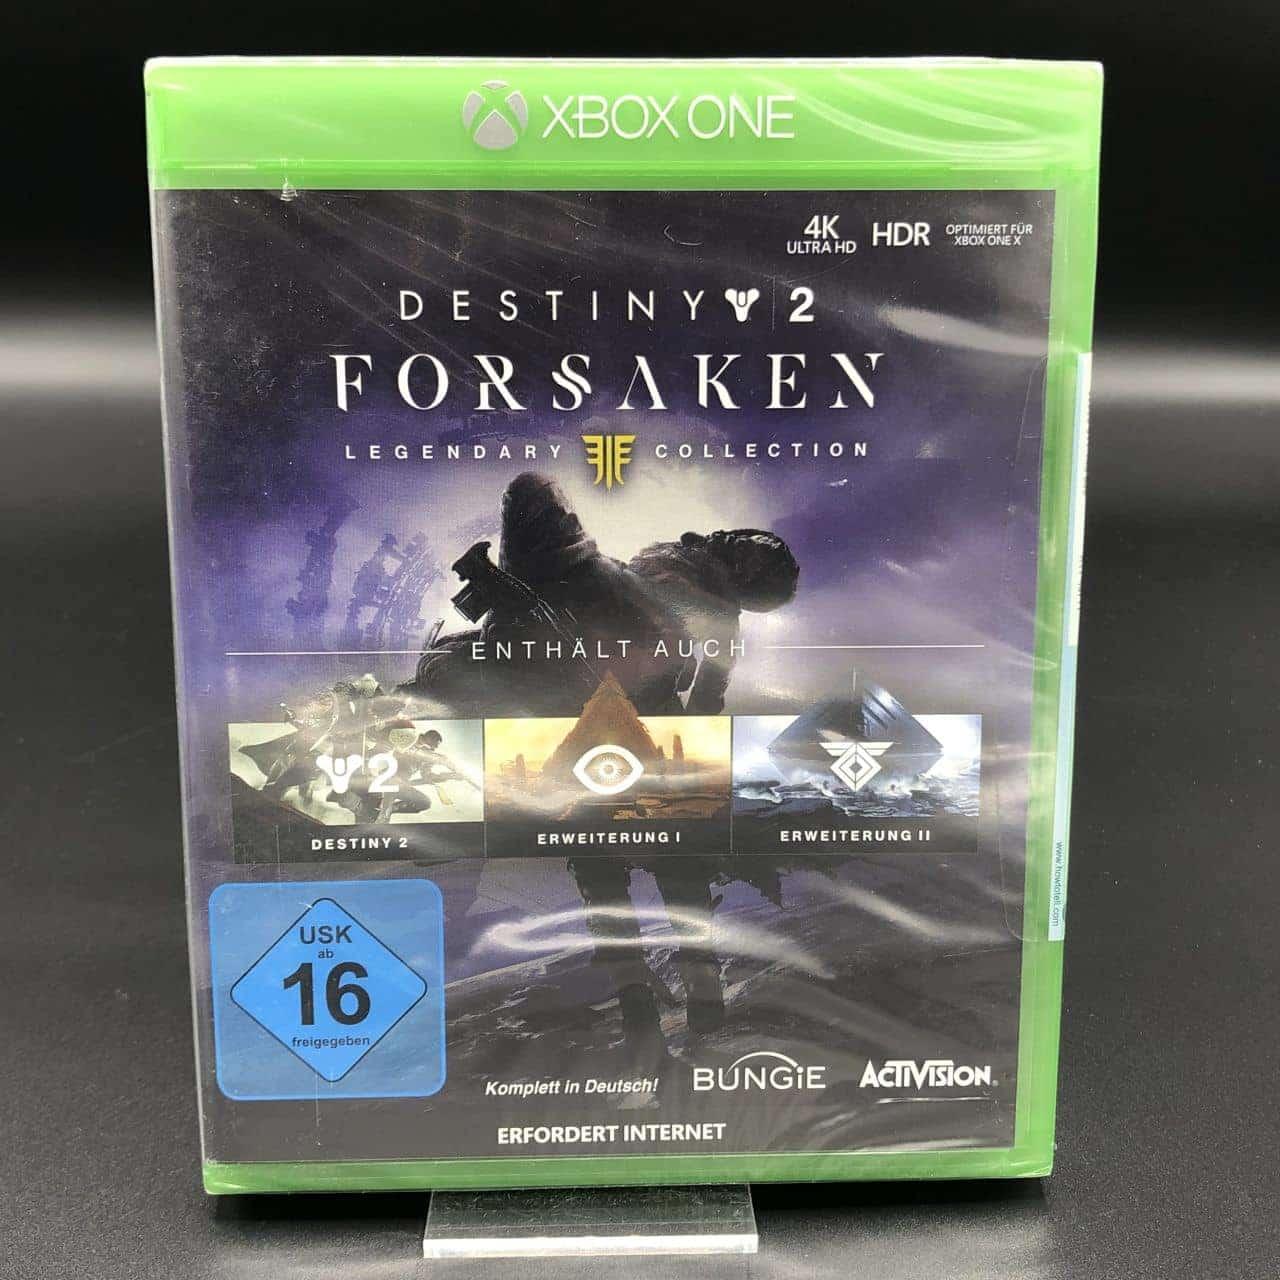 Destiny 2 Forsaken (Legendary Collection) (NEU) Xbox One